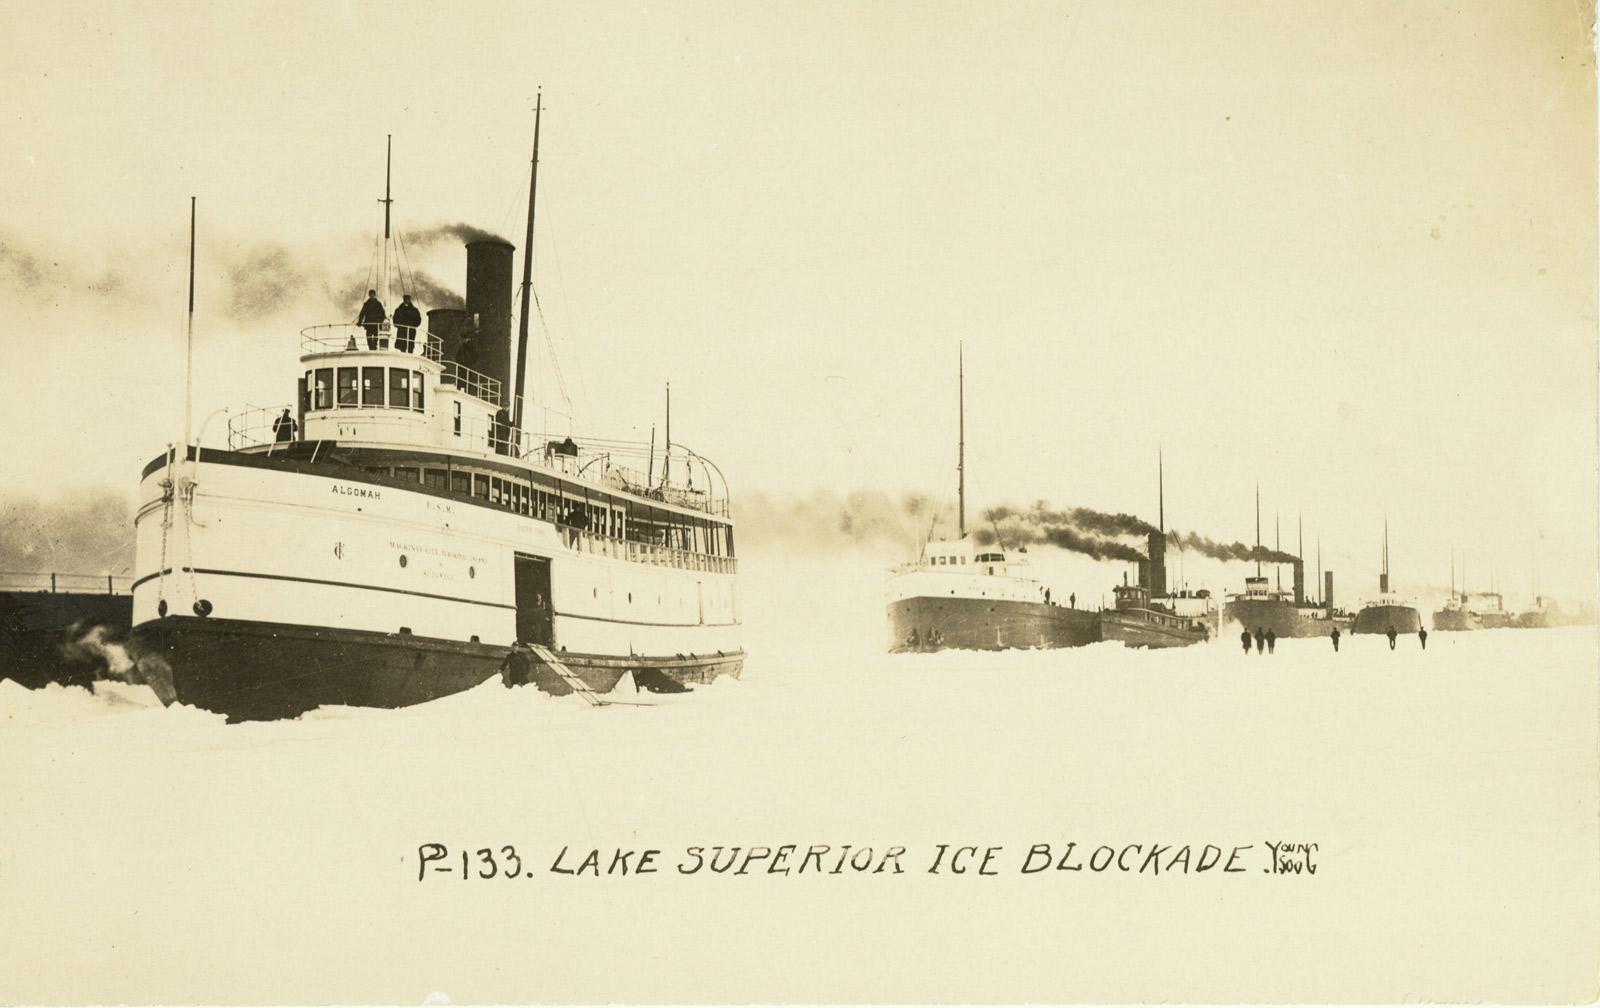 Lake Superior Ice Blockade